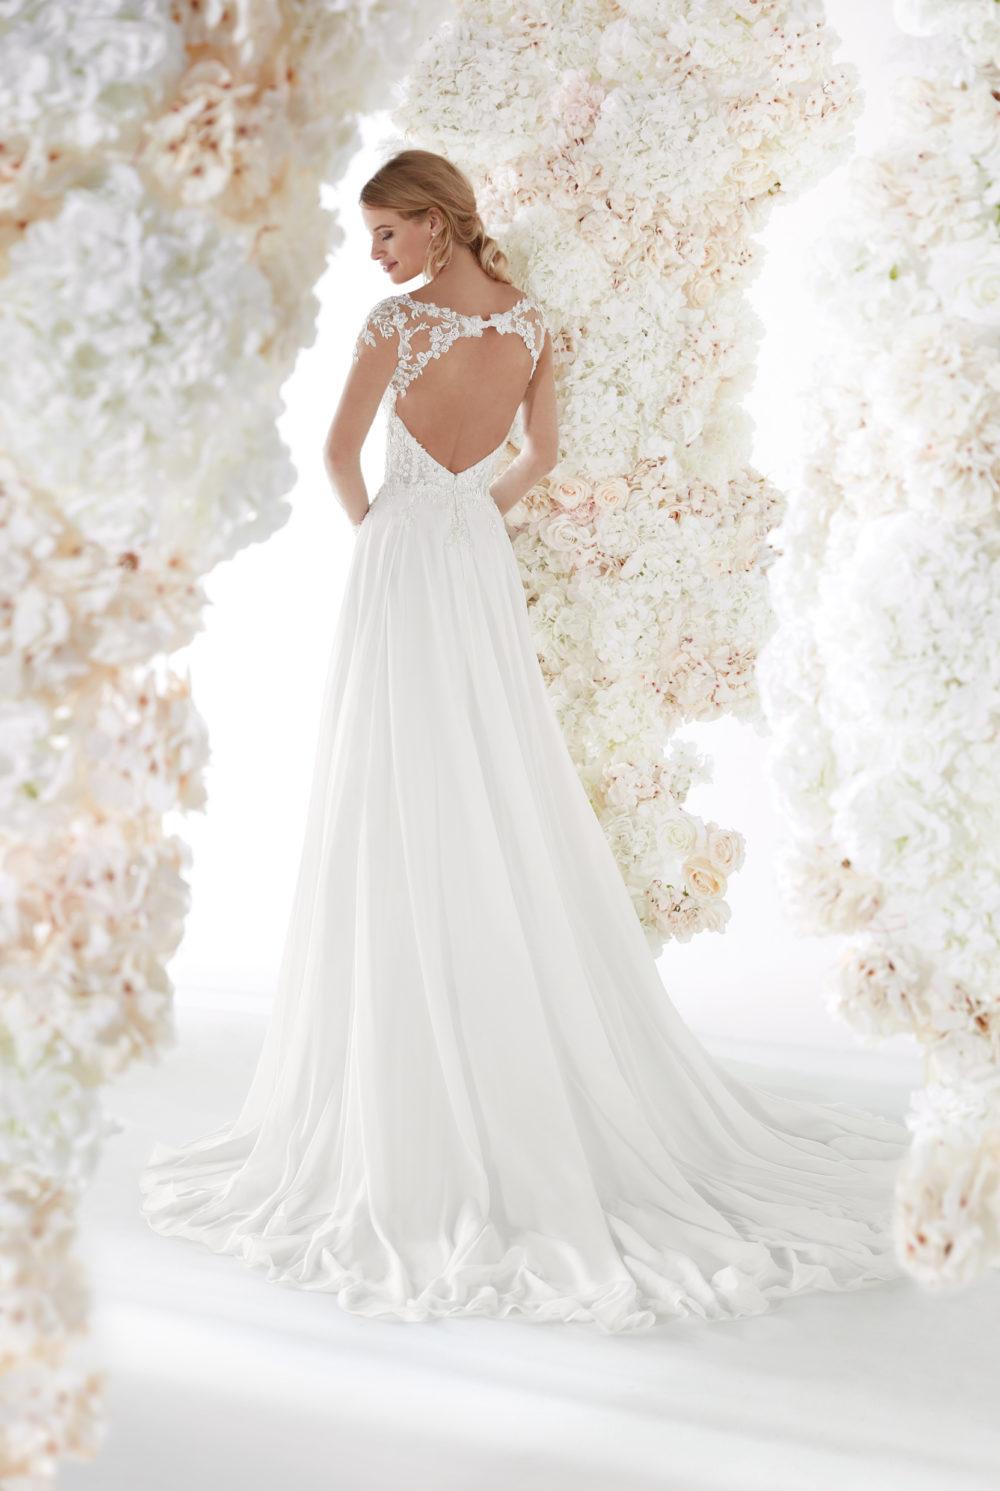 Mariages: abito da sposa Colet 2020 a Vicenza, Verona, Padova, Veneto COA20311